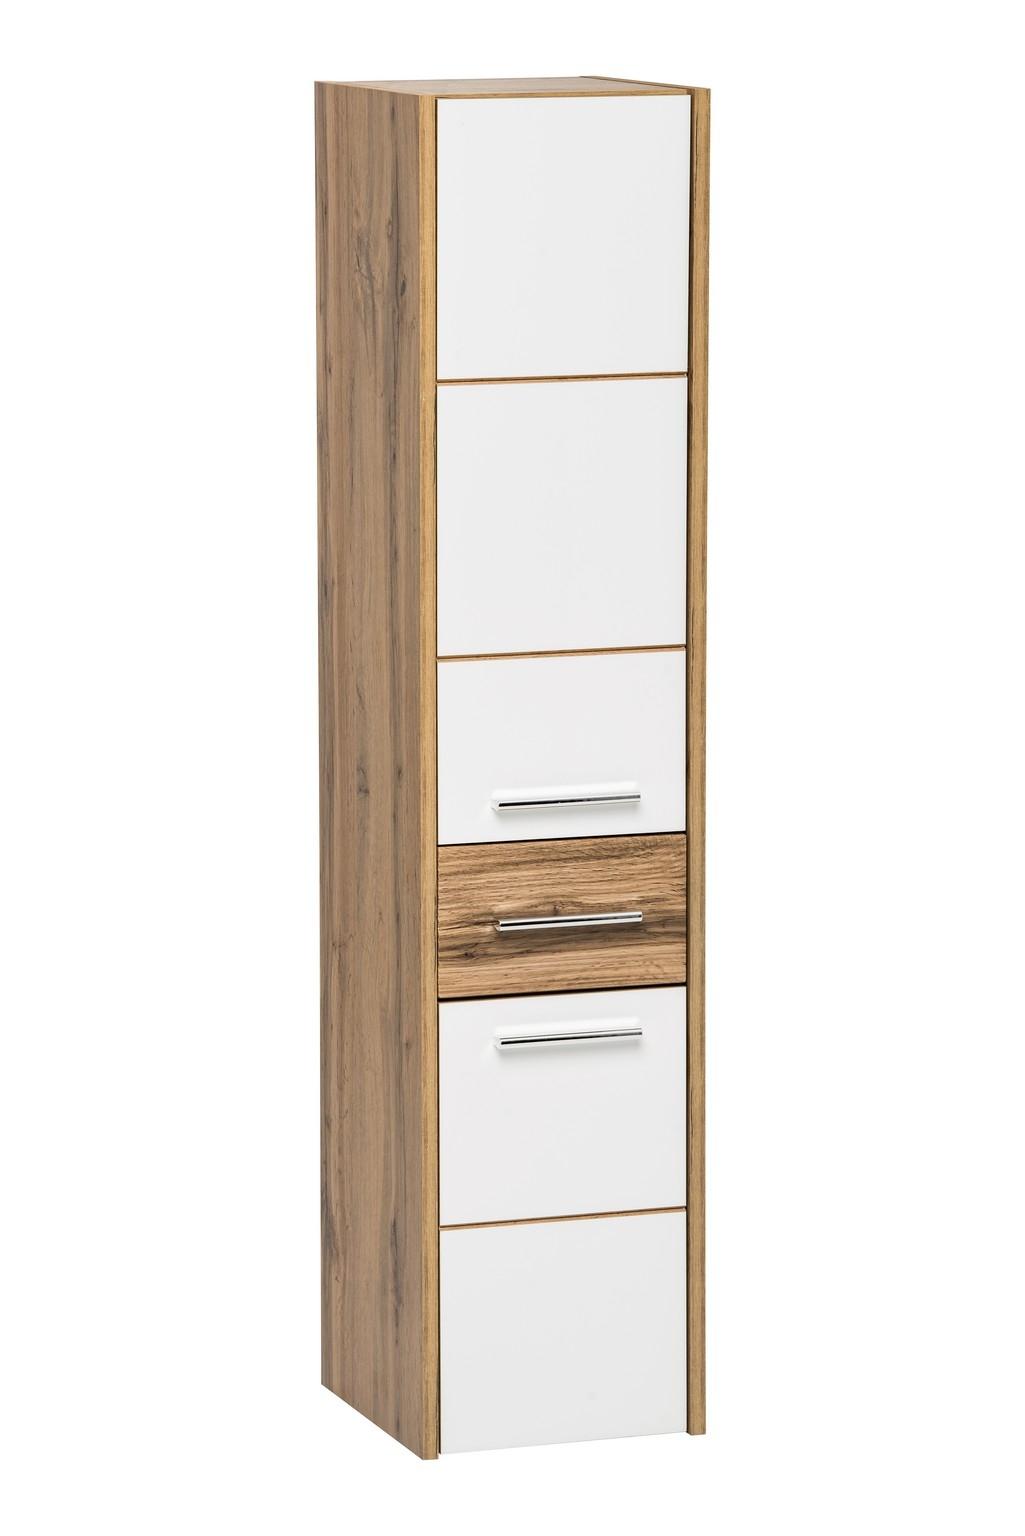 Dulap baie inalt cu 2 usi si 1 sertar, Ibiza White, l30xA33xH135 cm imagine